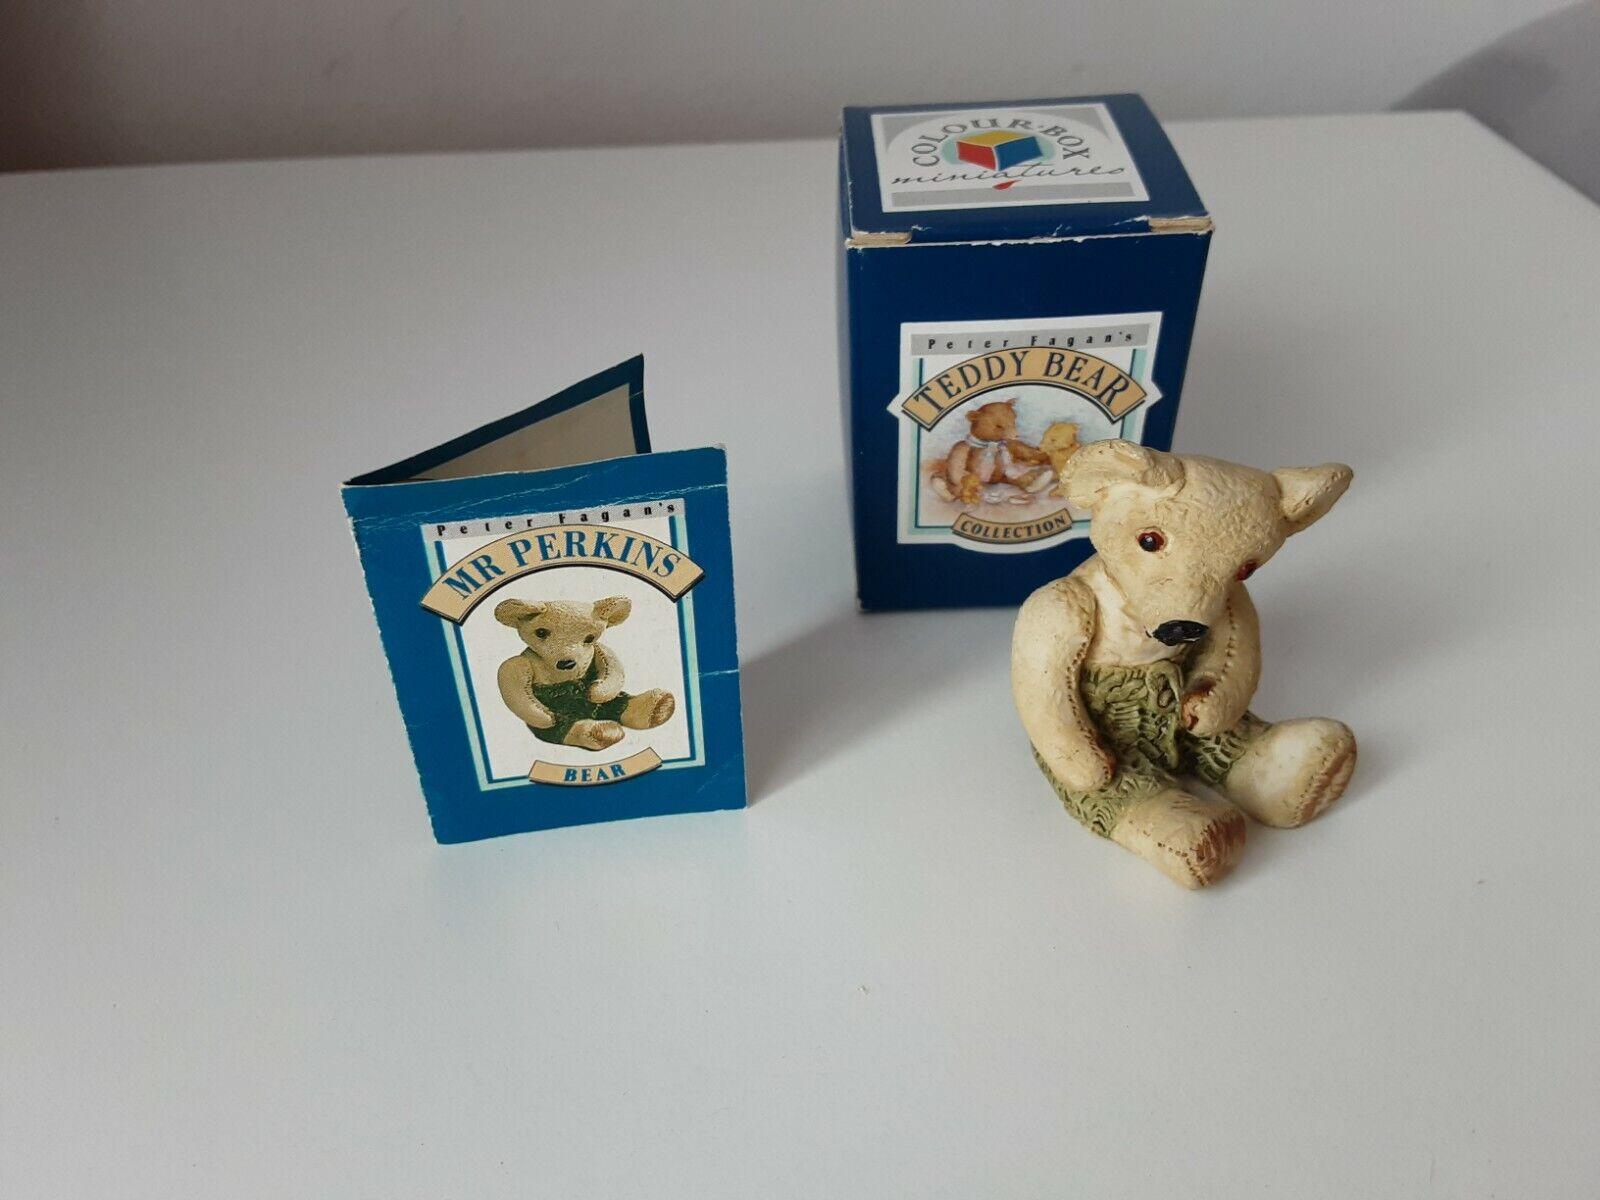 Colourbox Miniatures Teddy Bear Collection (Peter Fagan's) Mr Perkins TC456